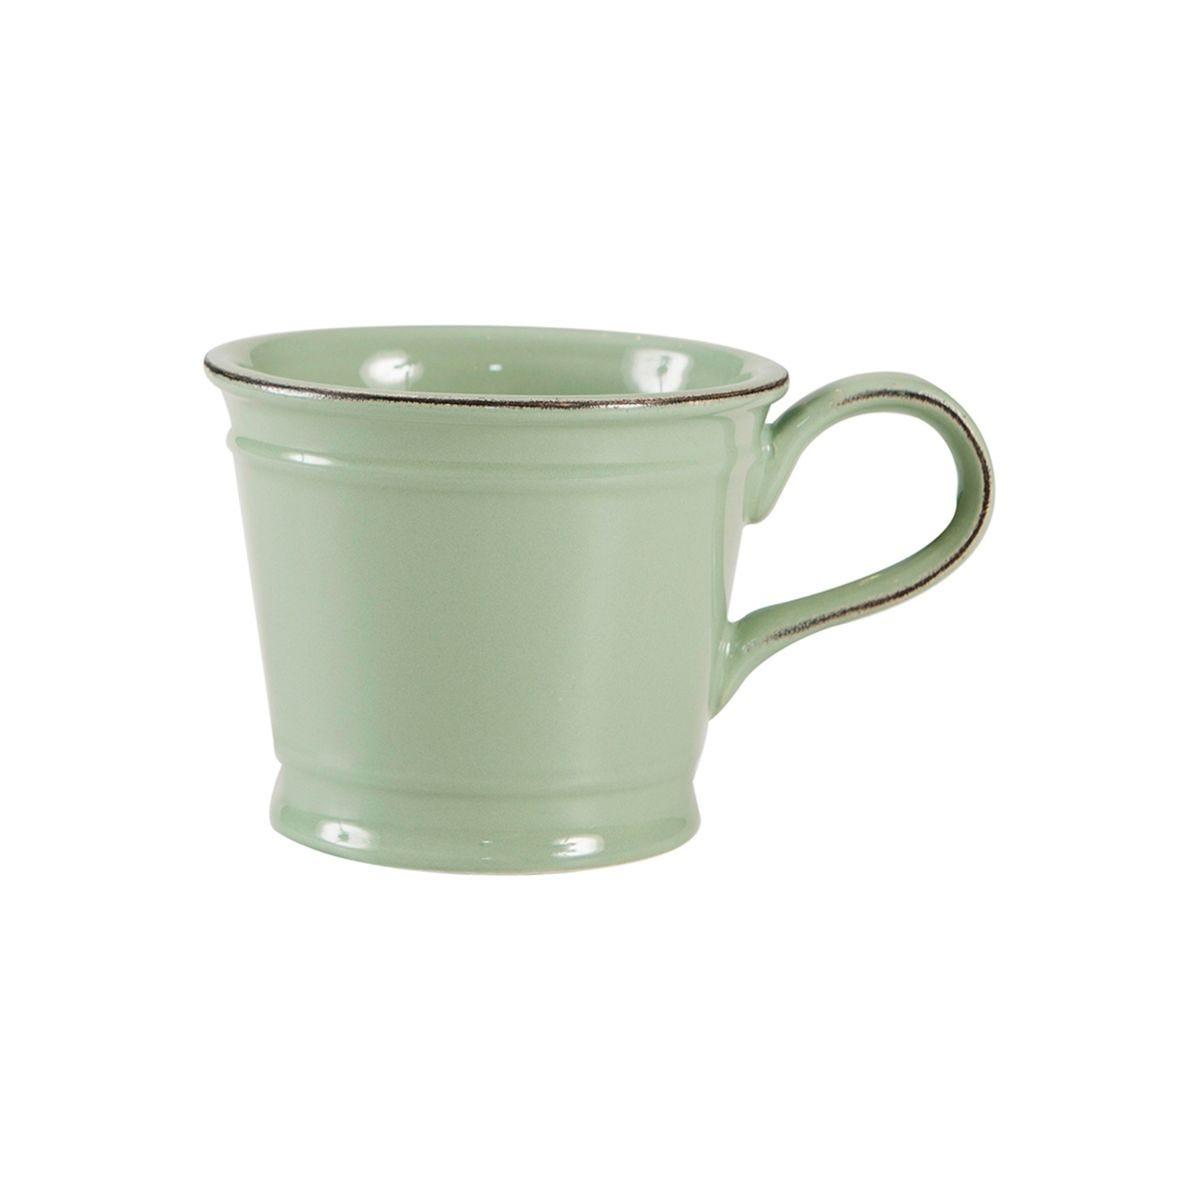 T&G Pride of Place Green Mug - 300ml